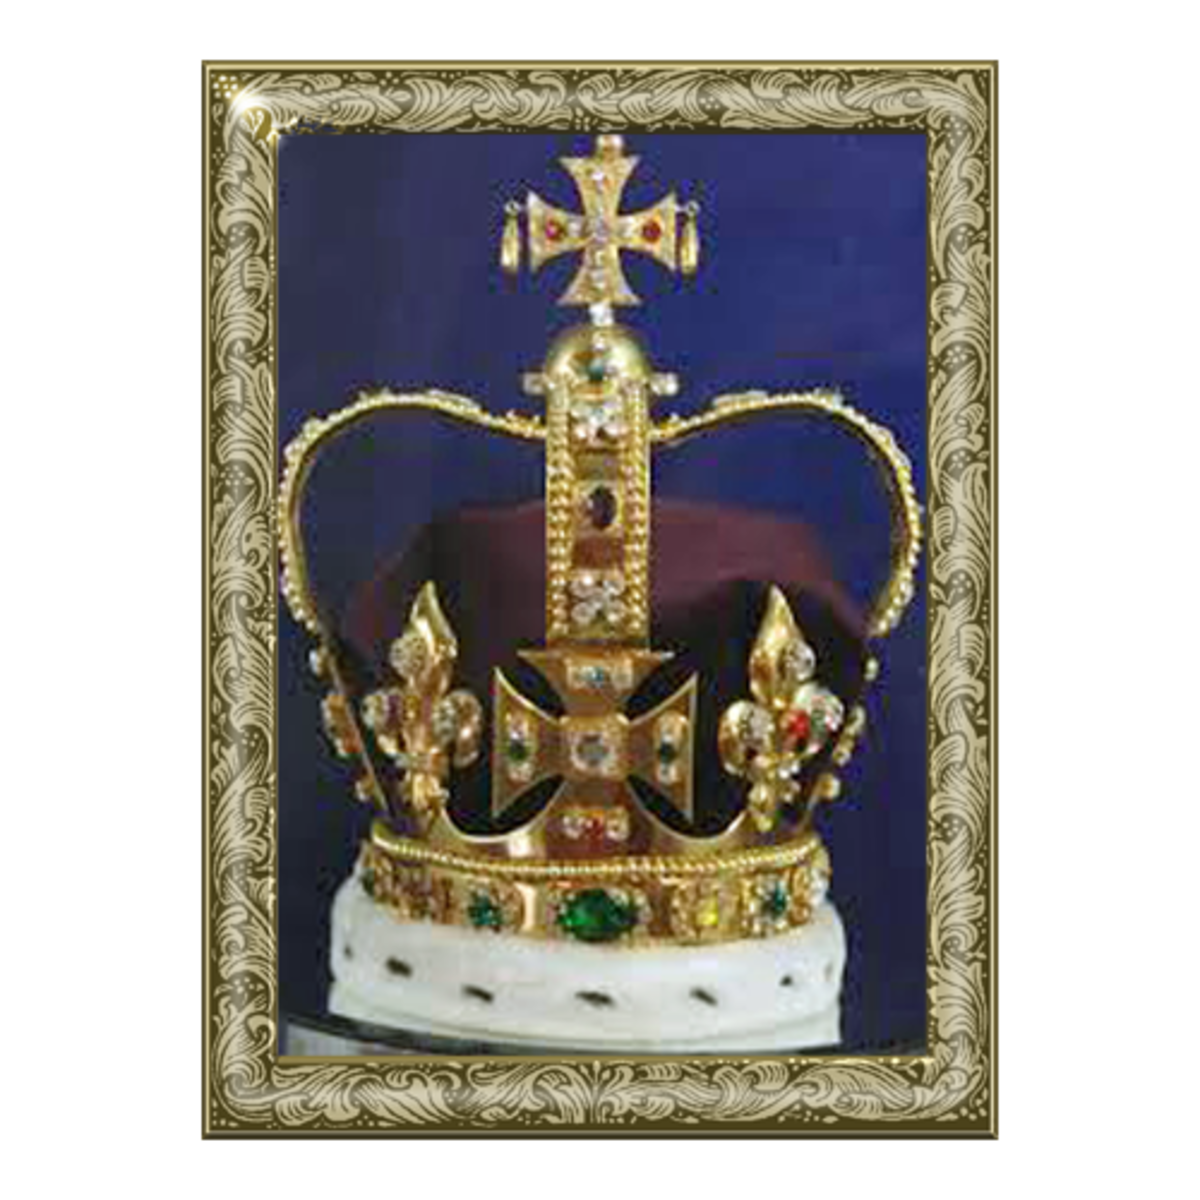 St  Edward's Crown  Crown Jewels of the United Kingdom